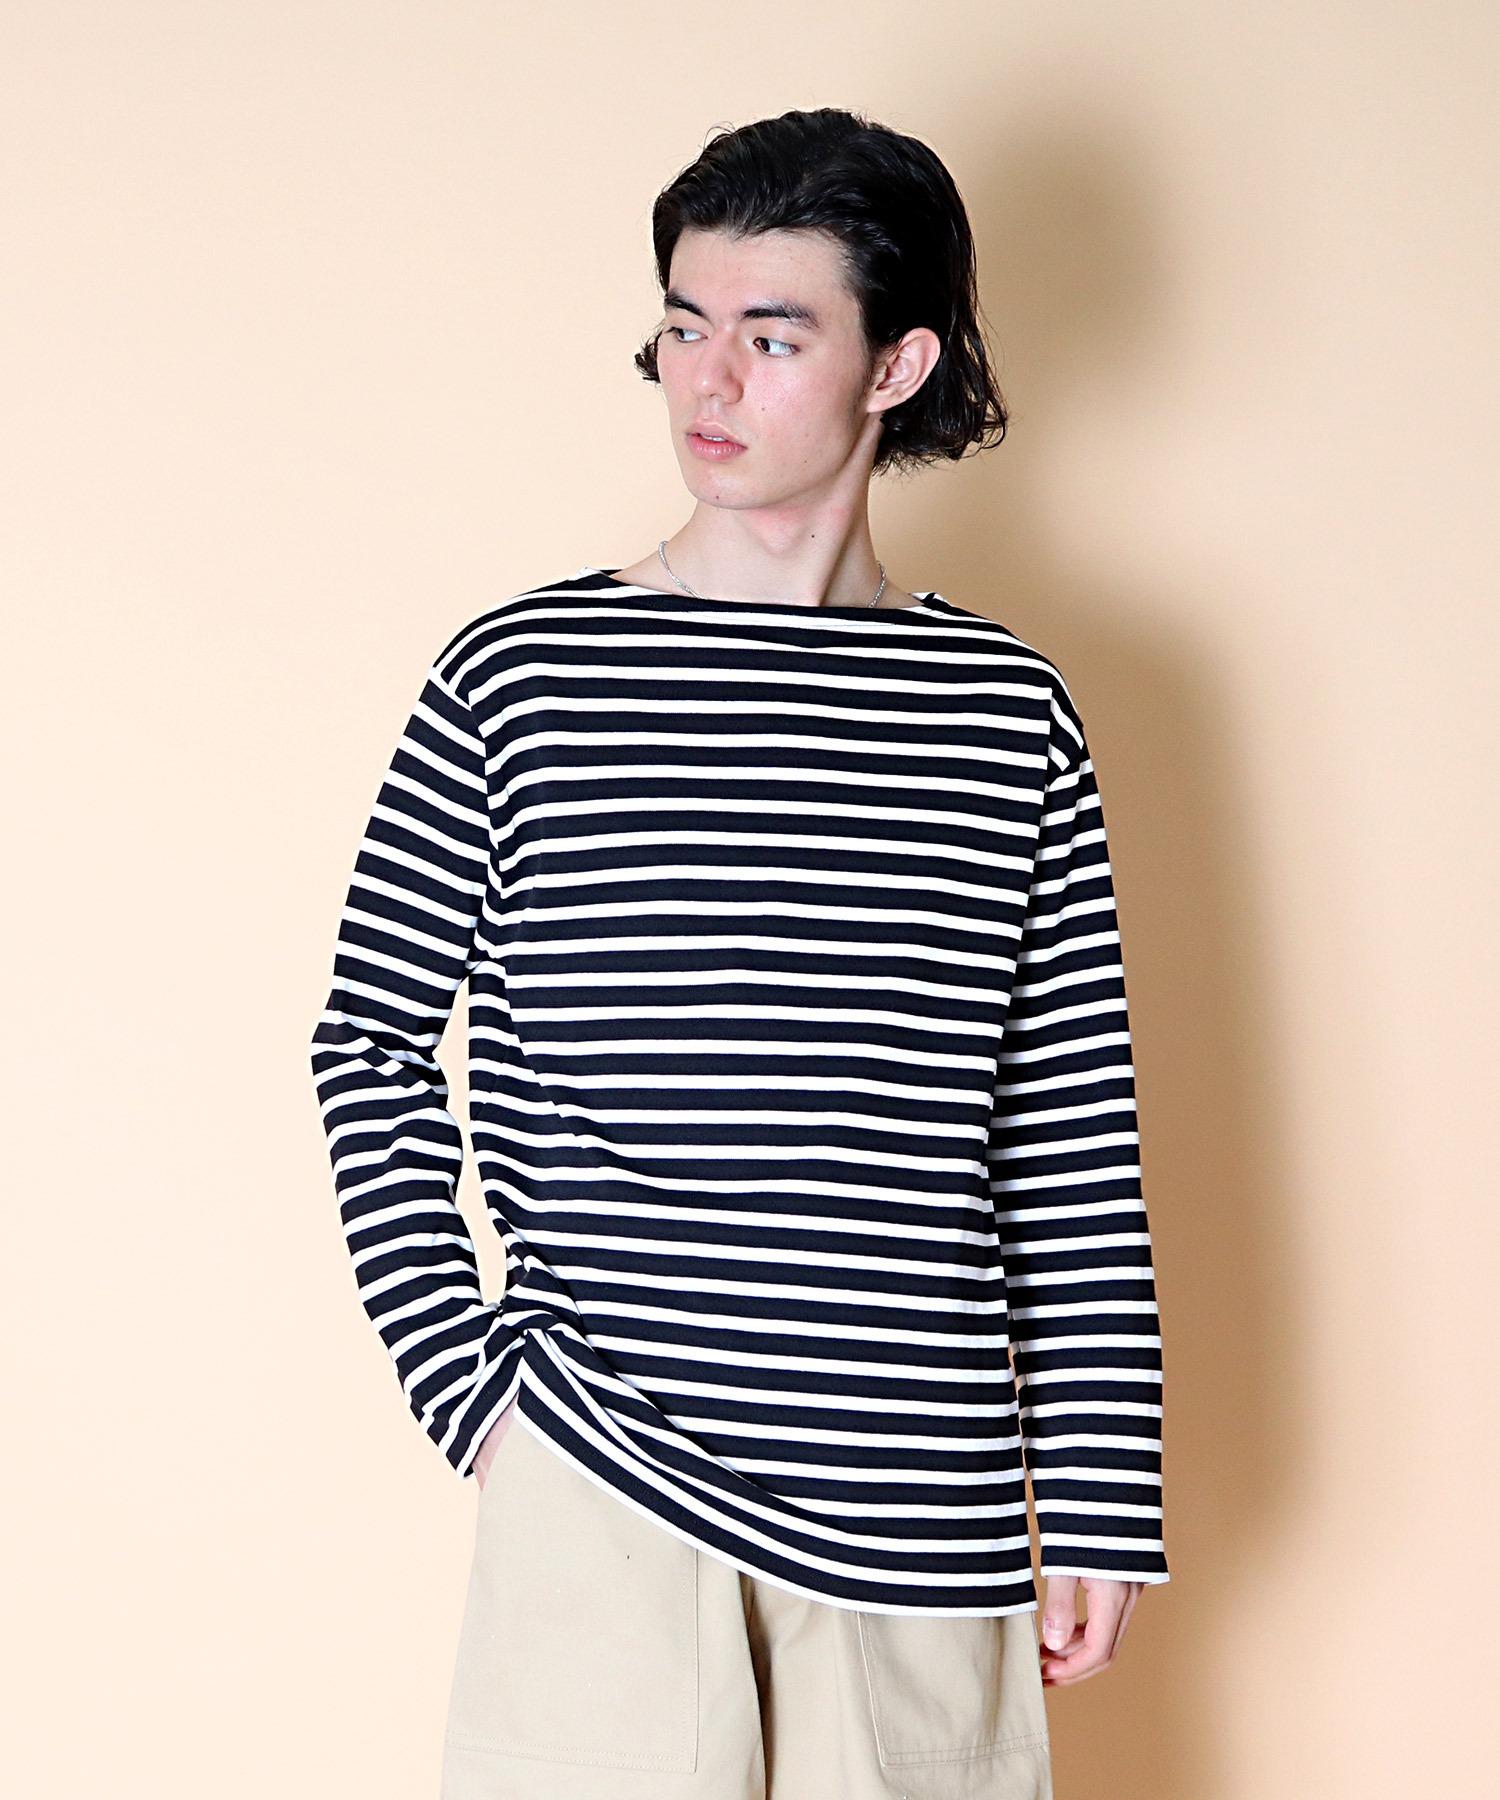 【 SAINT JAMES / セントジェームス 】 GUILDO  バスクシャツ R A 2501・U A 2503